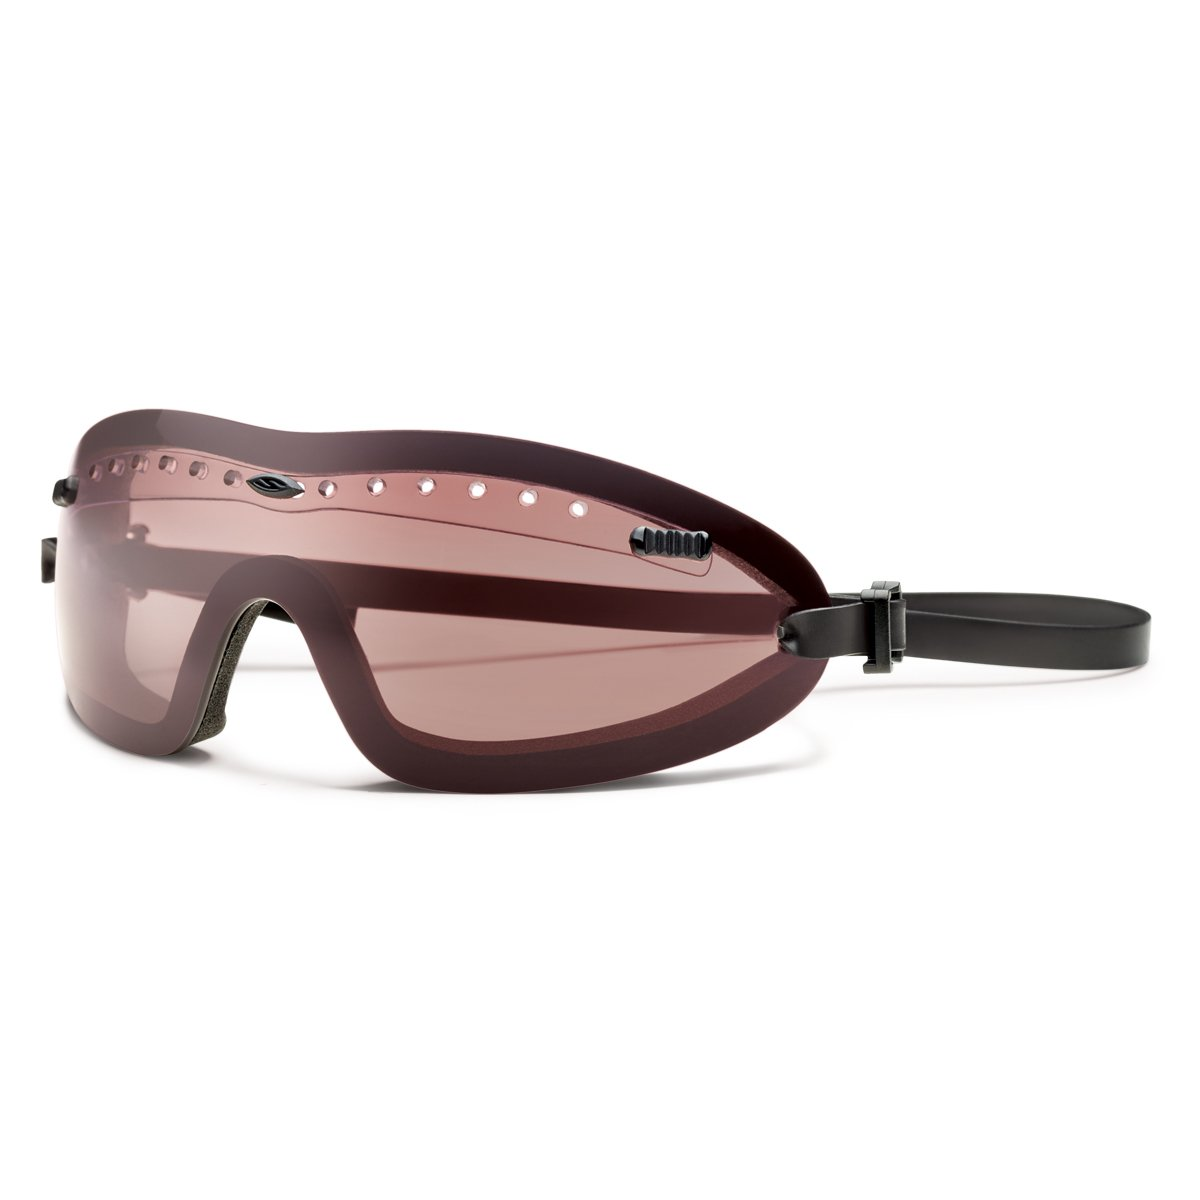 c7ae81d416c Amazon.com   Smith Optics Boogie Regulator Elite Tactical Goggles   Sports    Outdoors